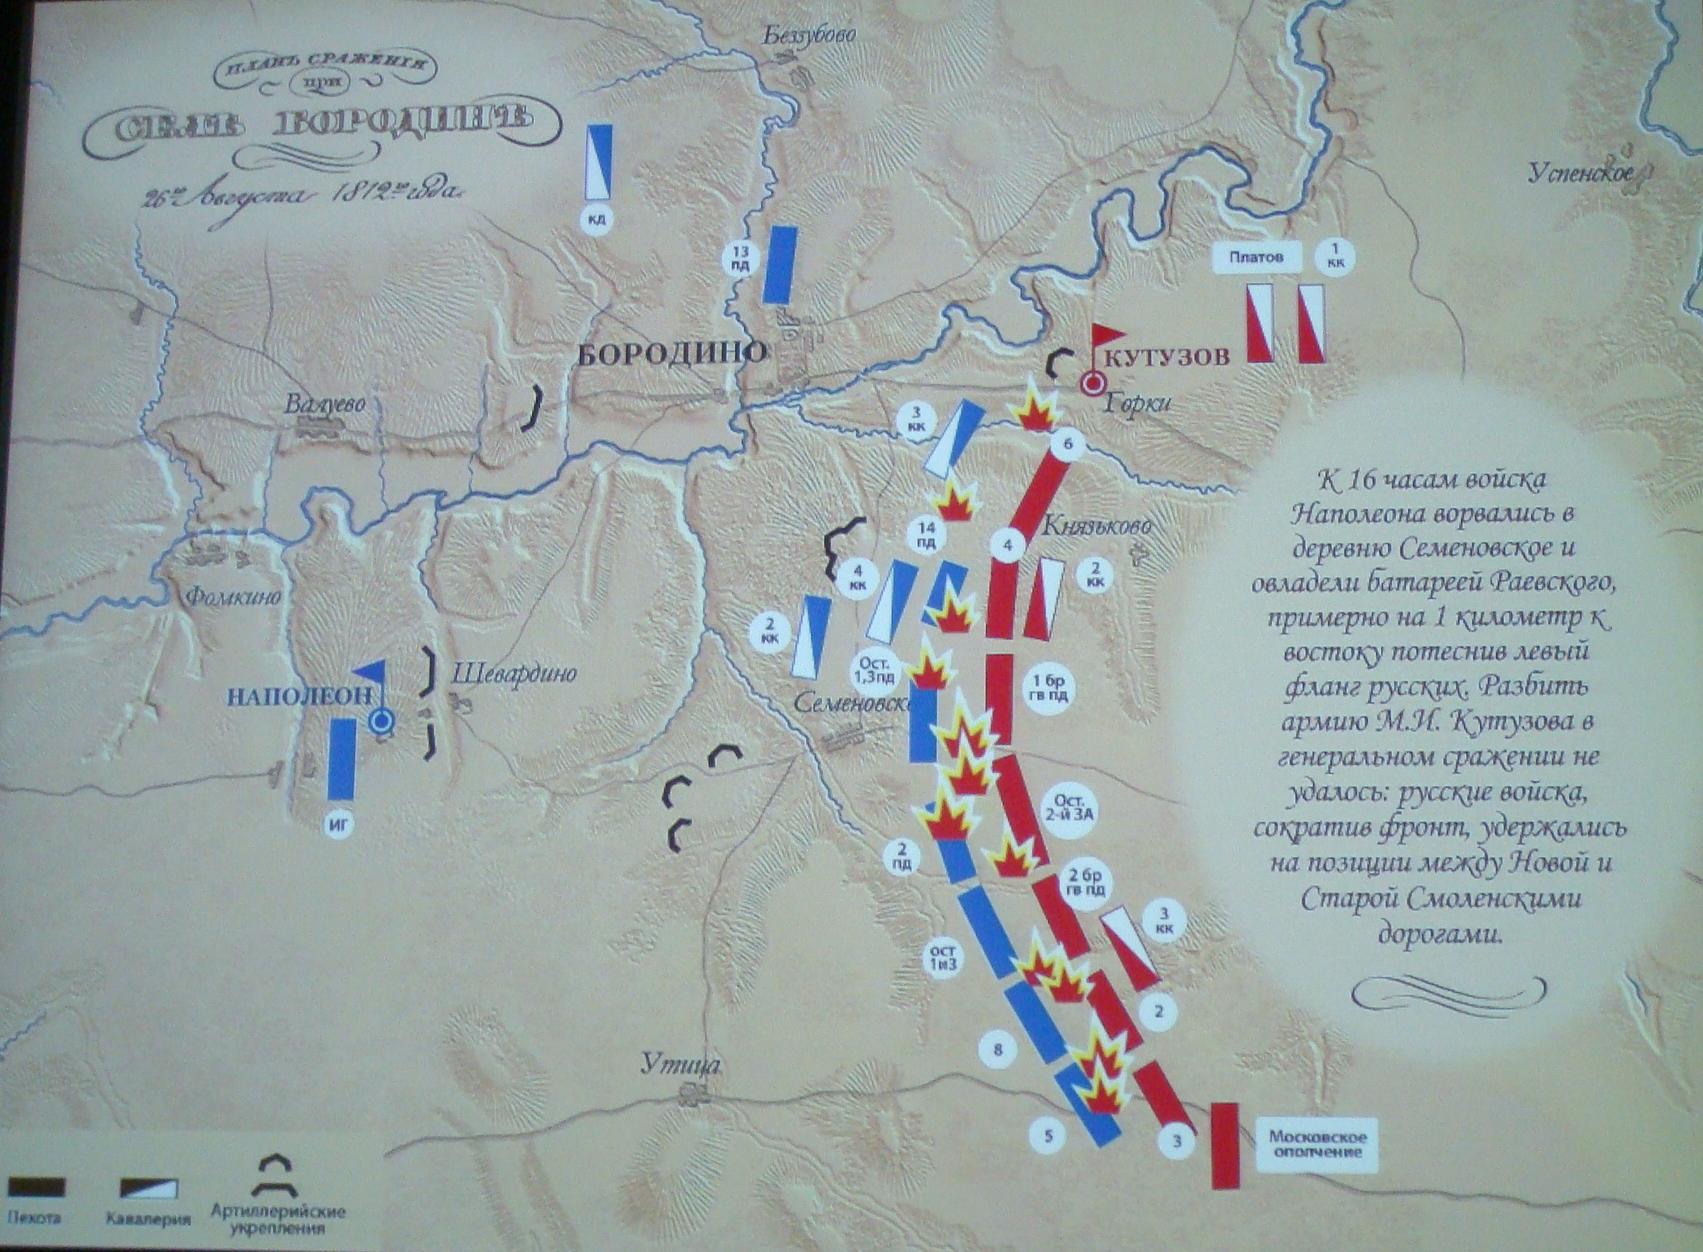 Borodino battle field Plan